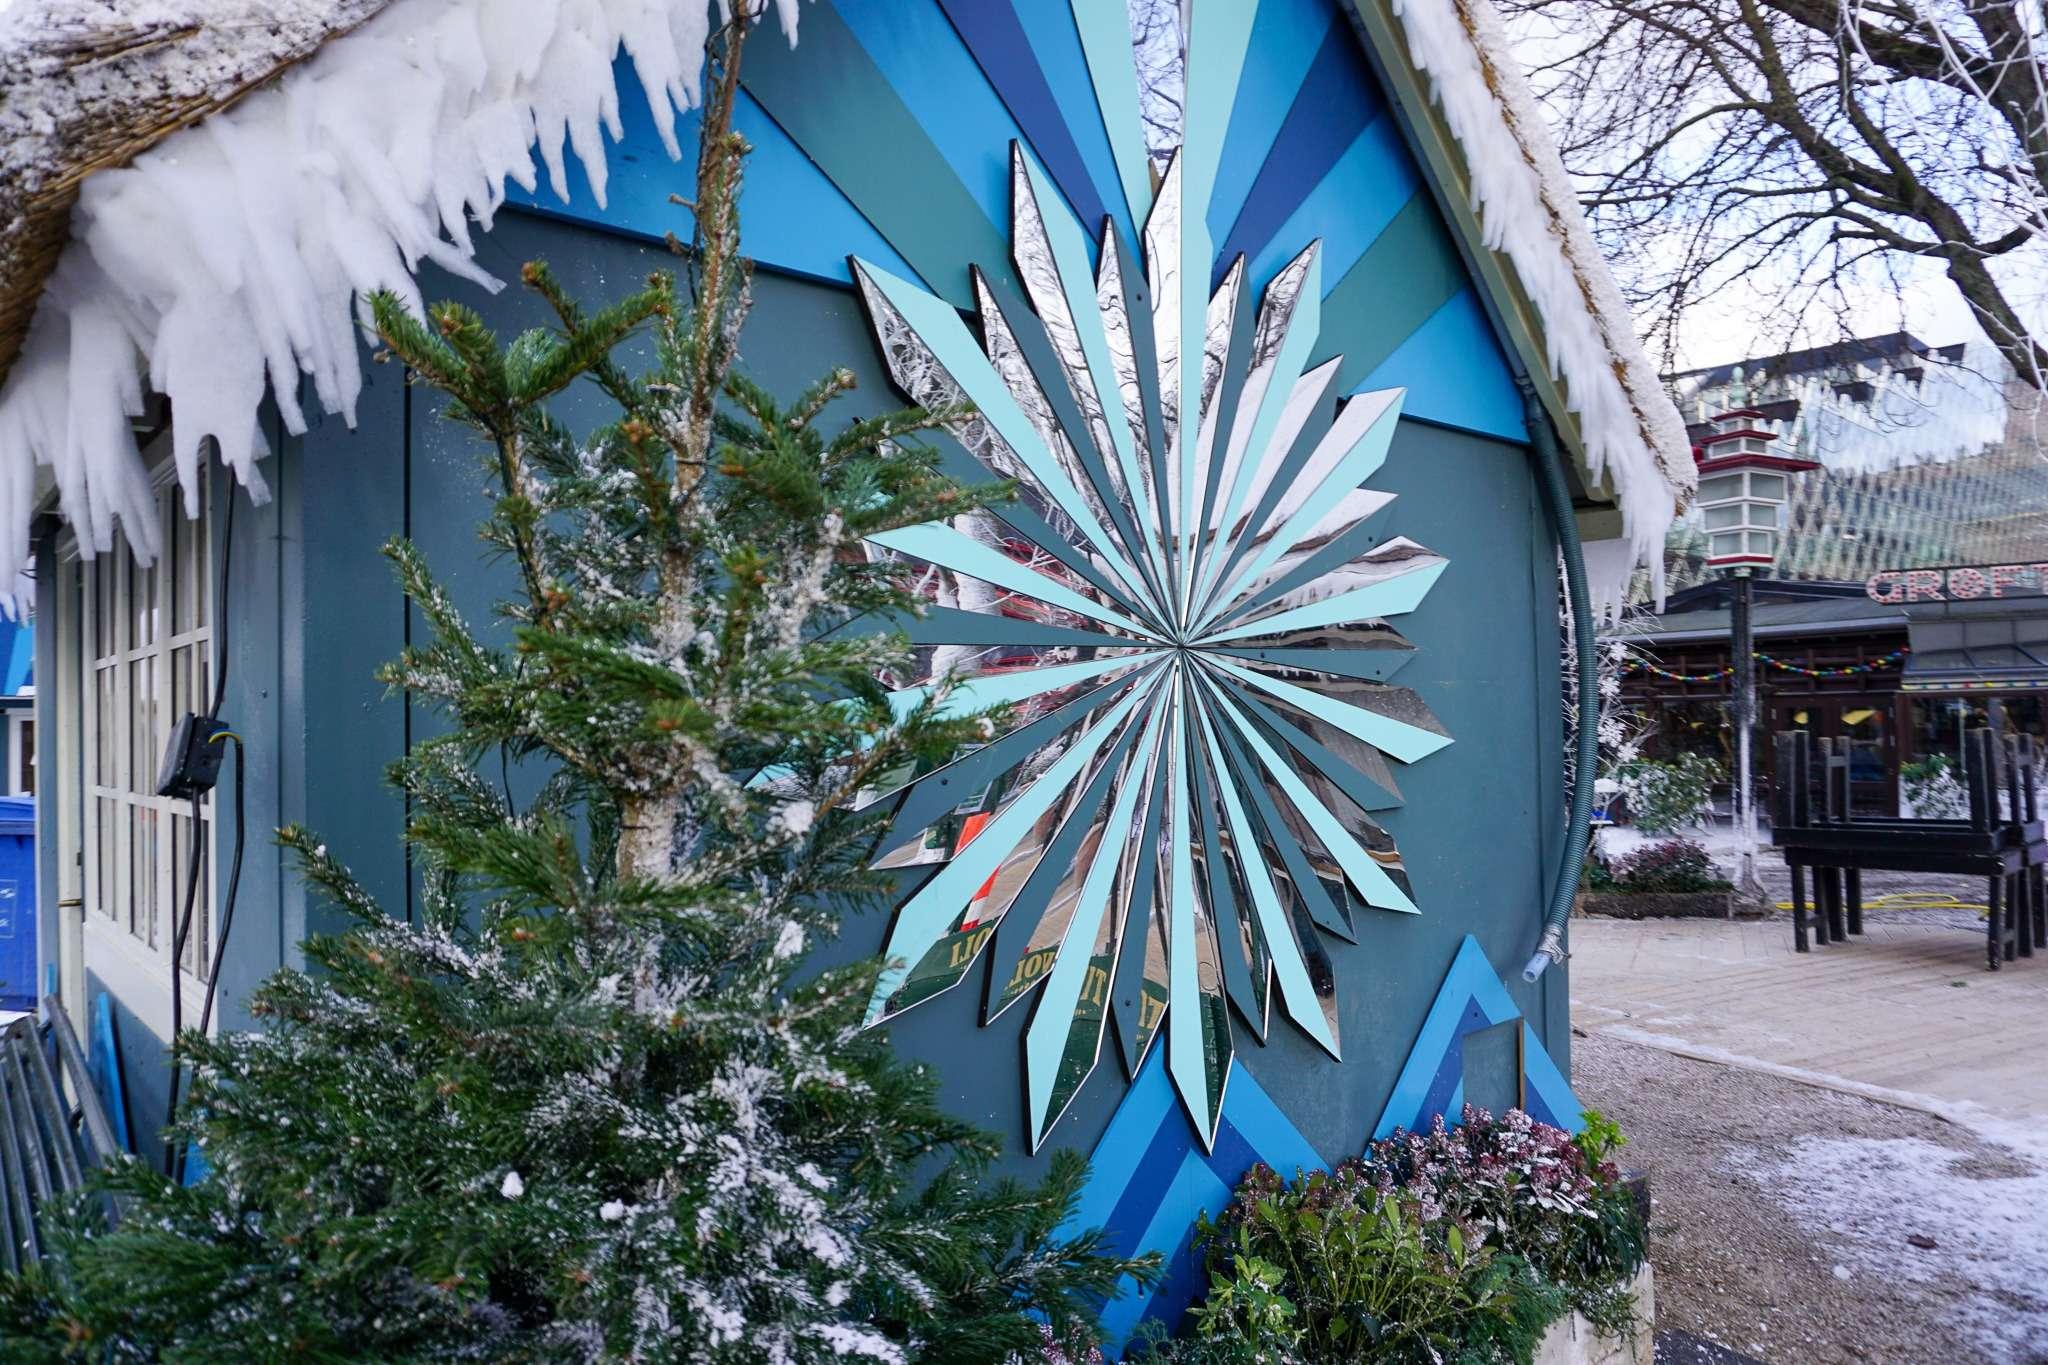 snowflake Christmas decoration in Tivoli Gardens